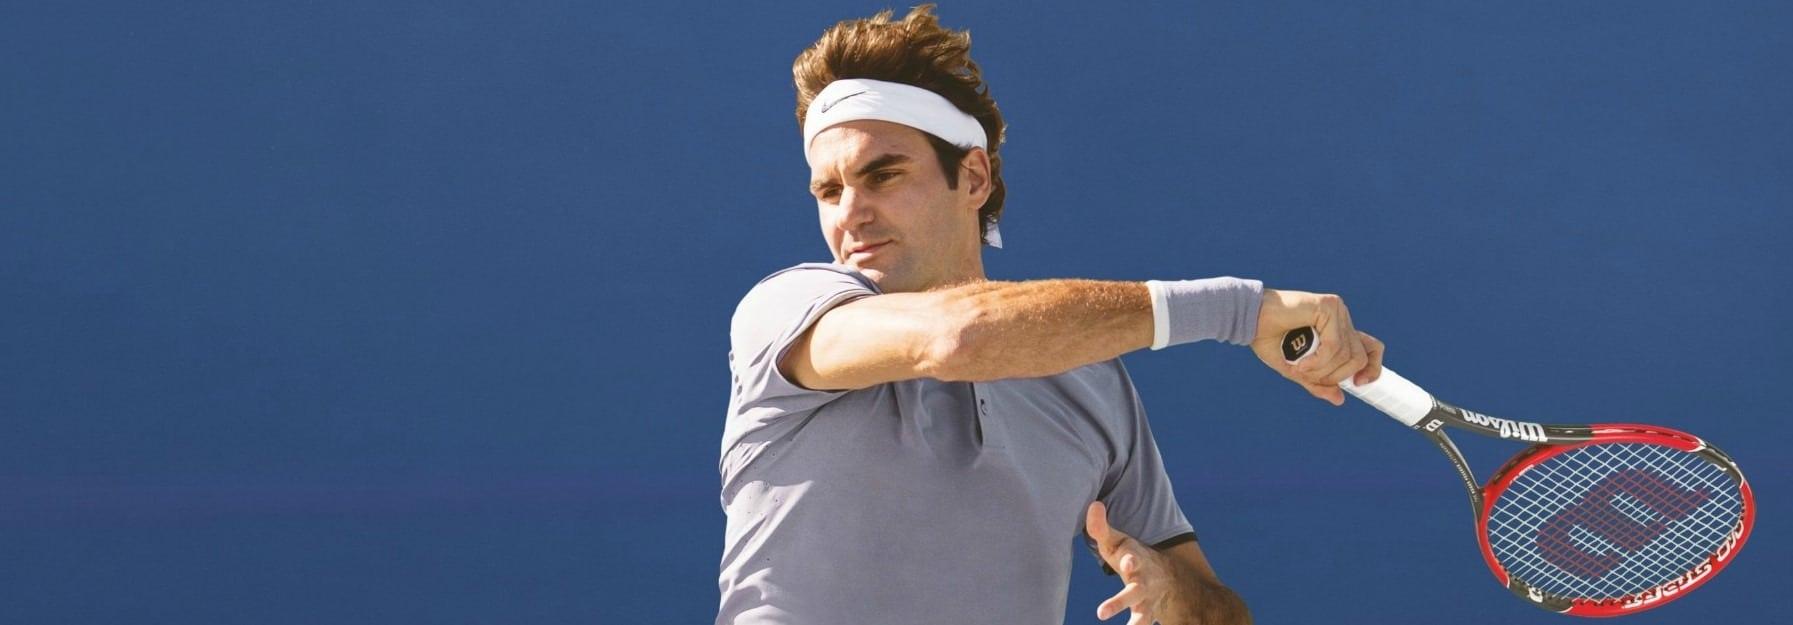 Wilson tennisrackets - Roger Federer - Racketshop de Bataaf